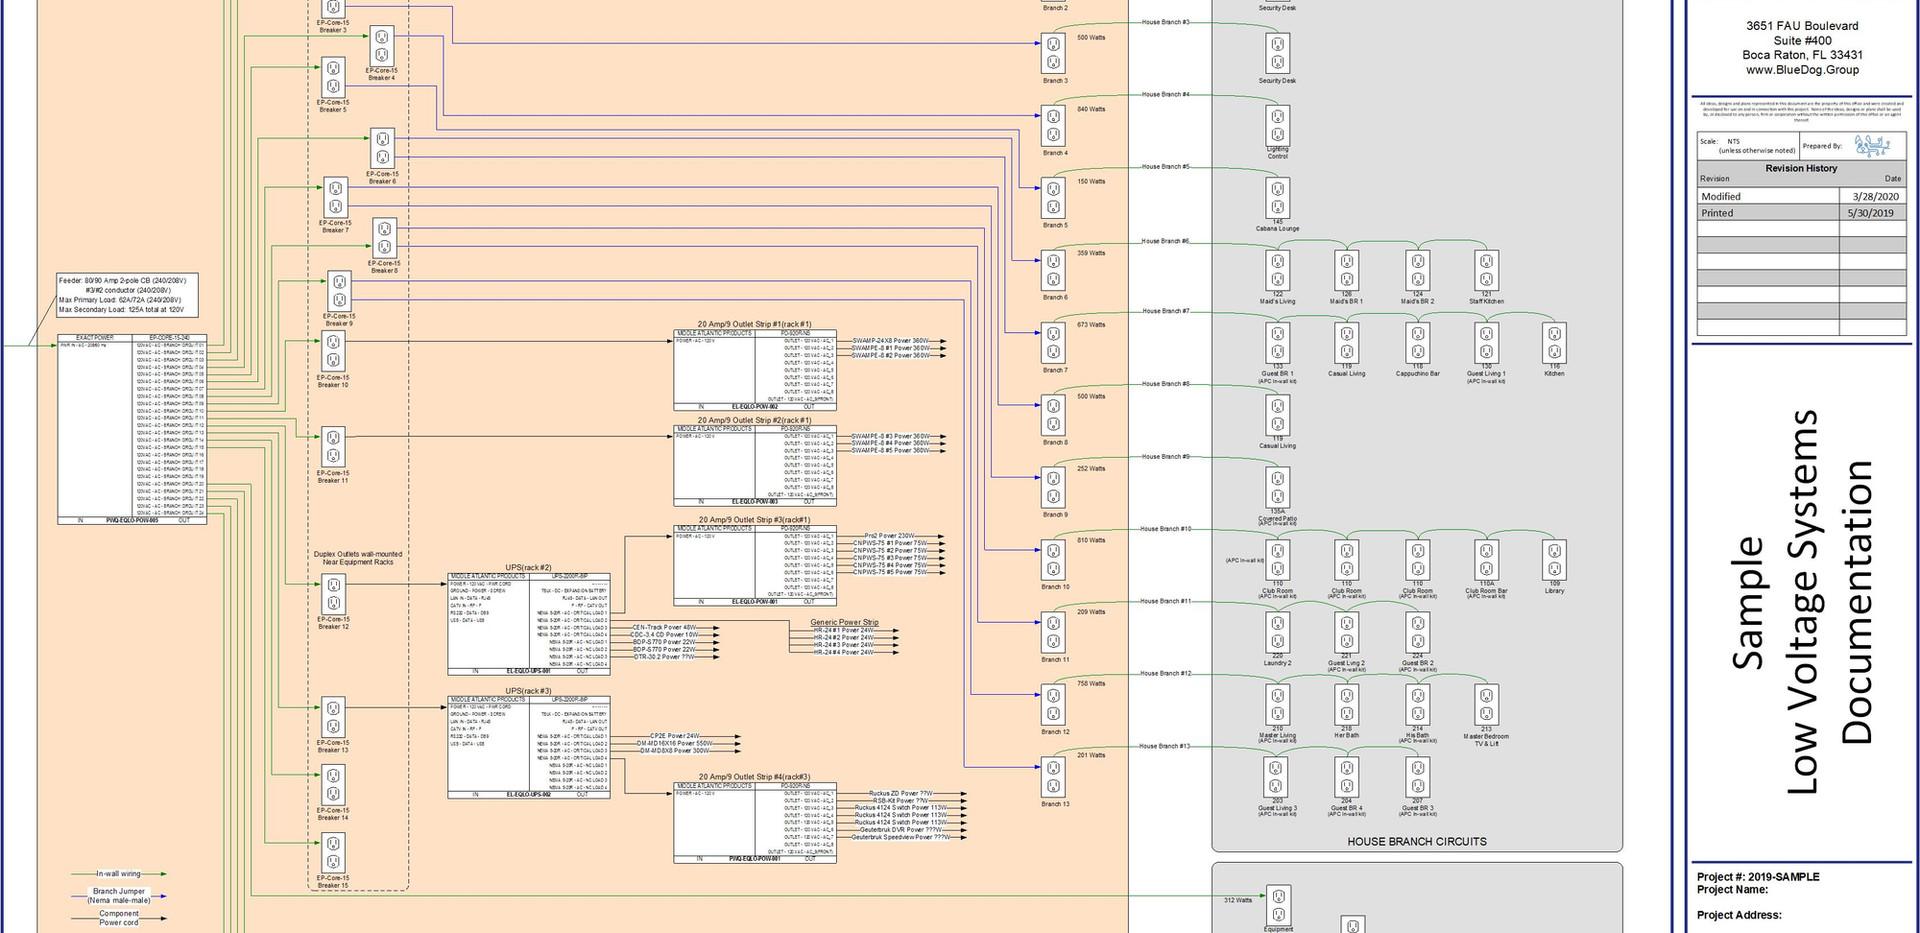 BDG-Sample LV Drawings-LV-v1.0-Tech Powe